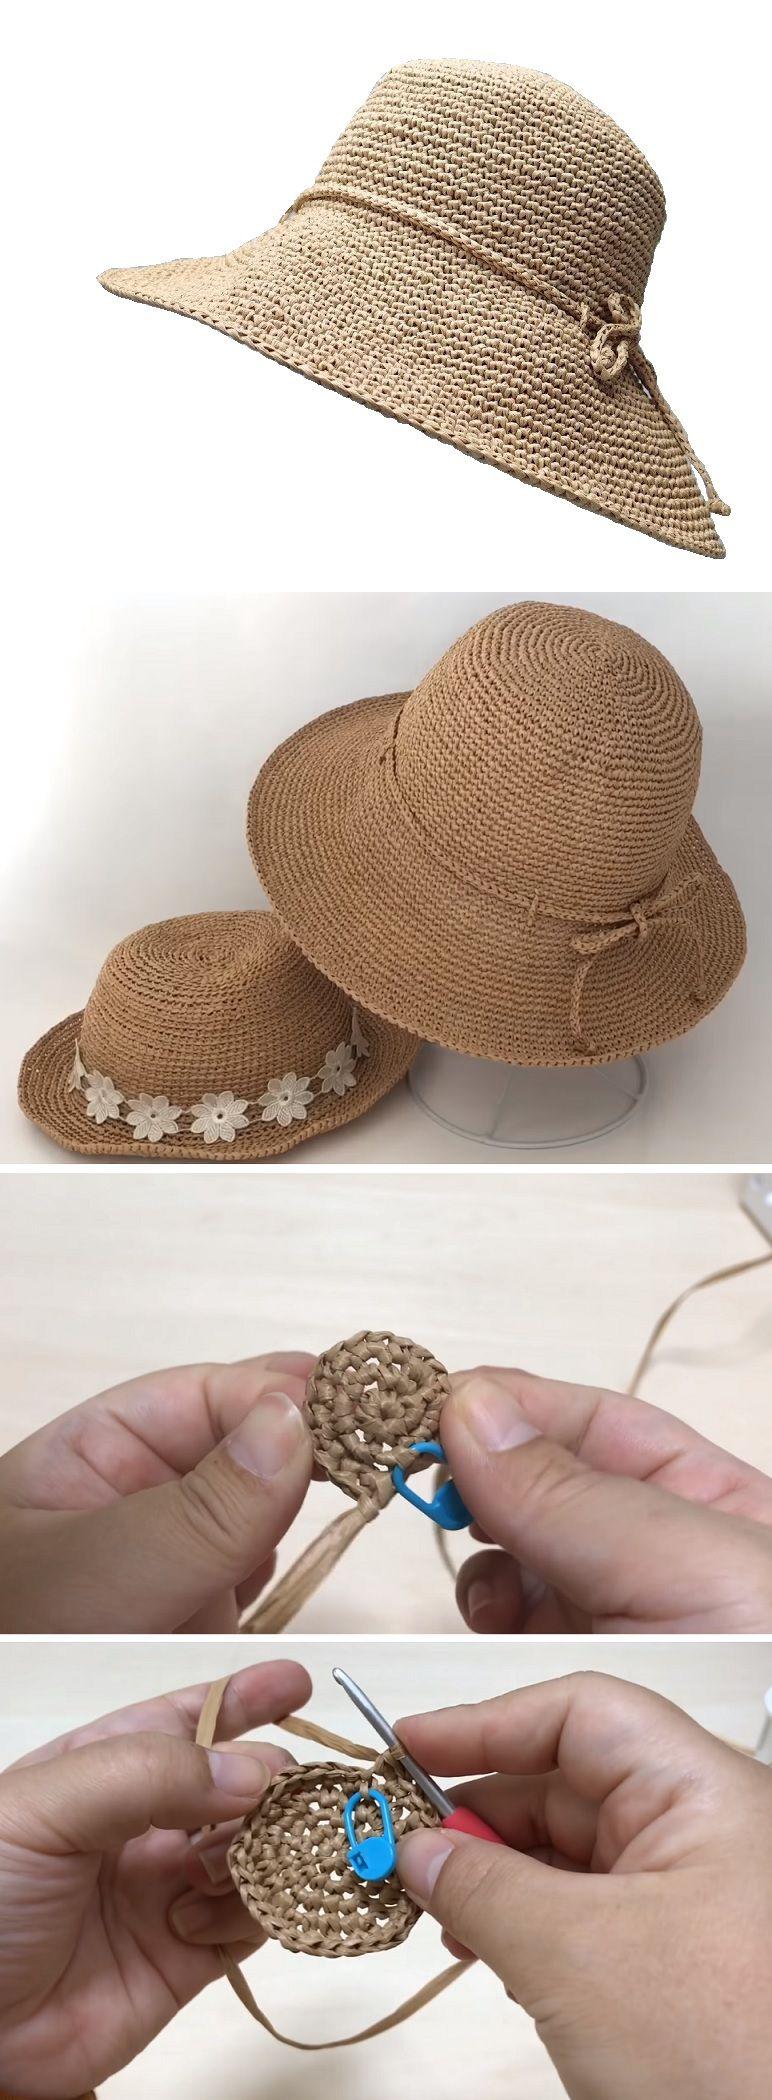 Crochet Fedora Tutorial – Handmade paris #beanies